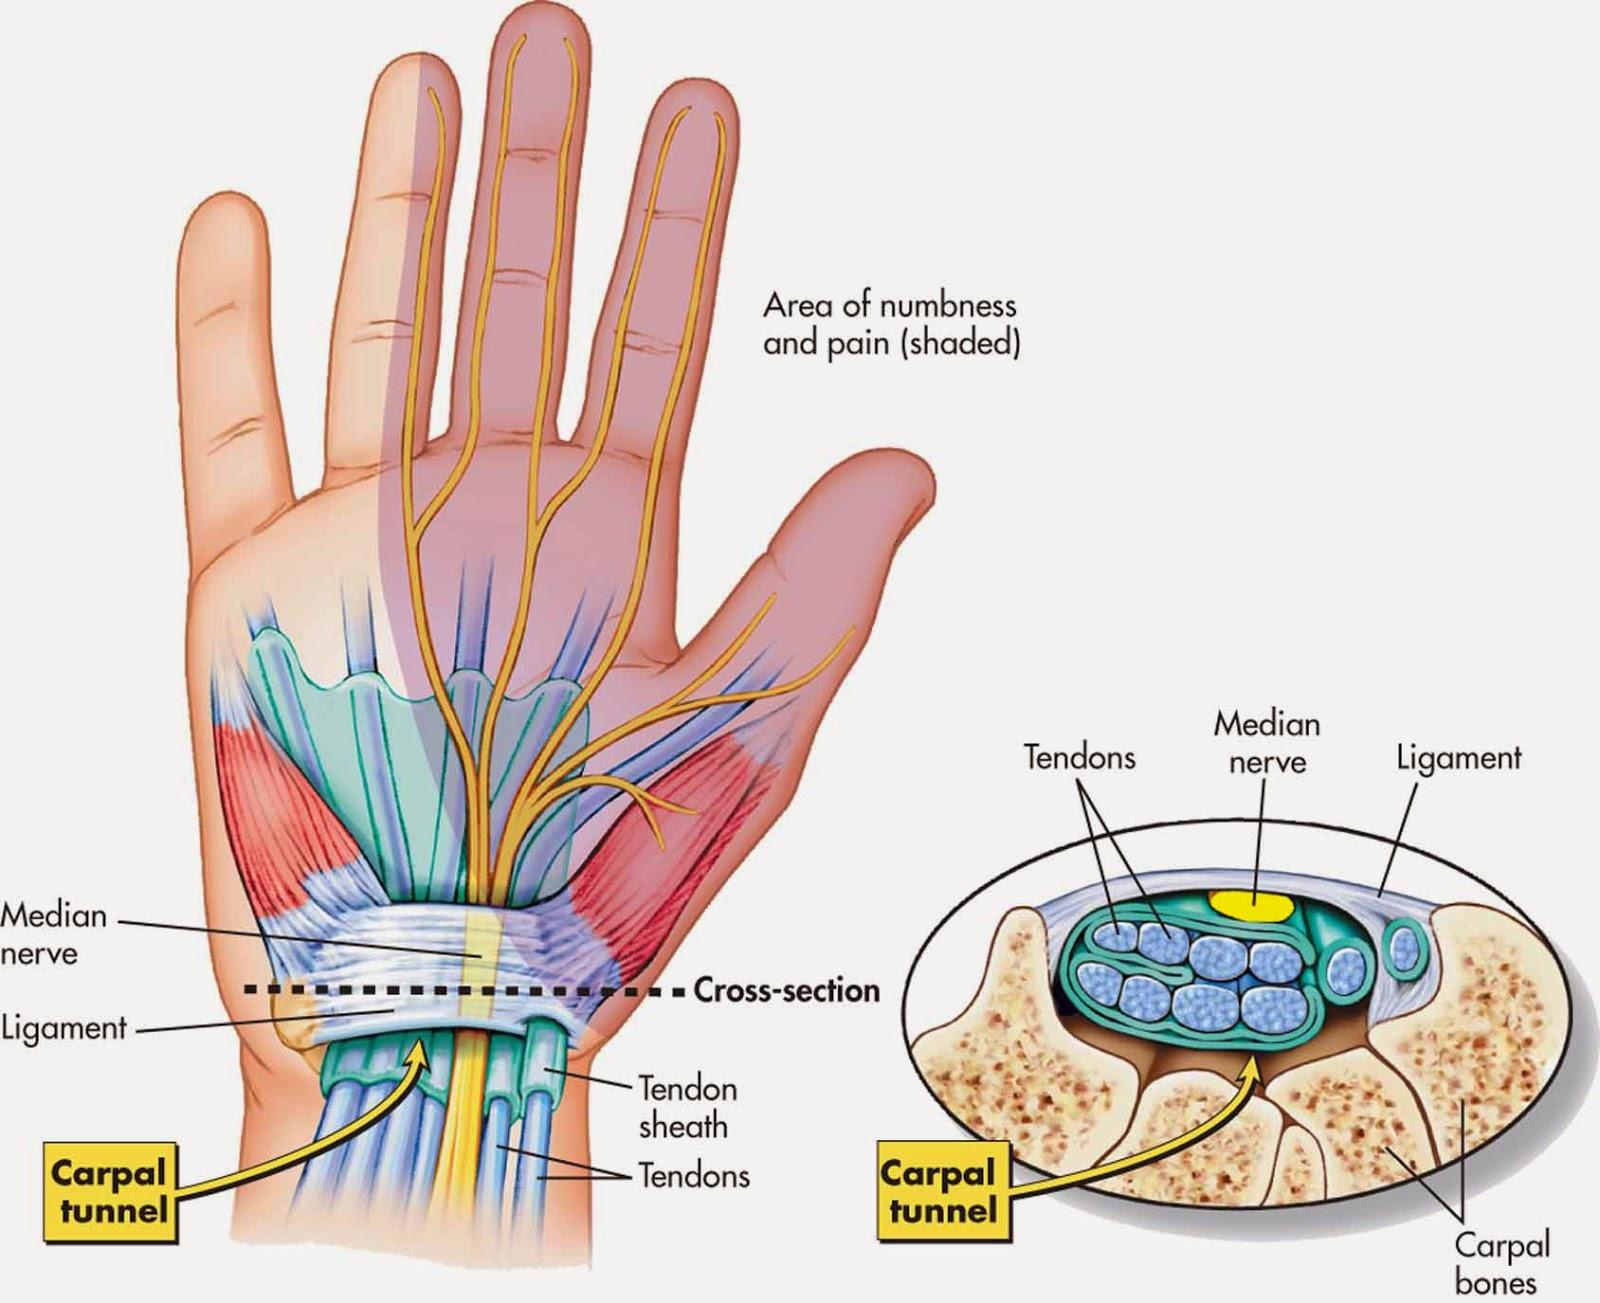 gambar cts, gambar carpal tunnel syndrome, anatomi cts